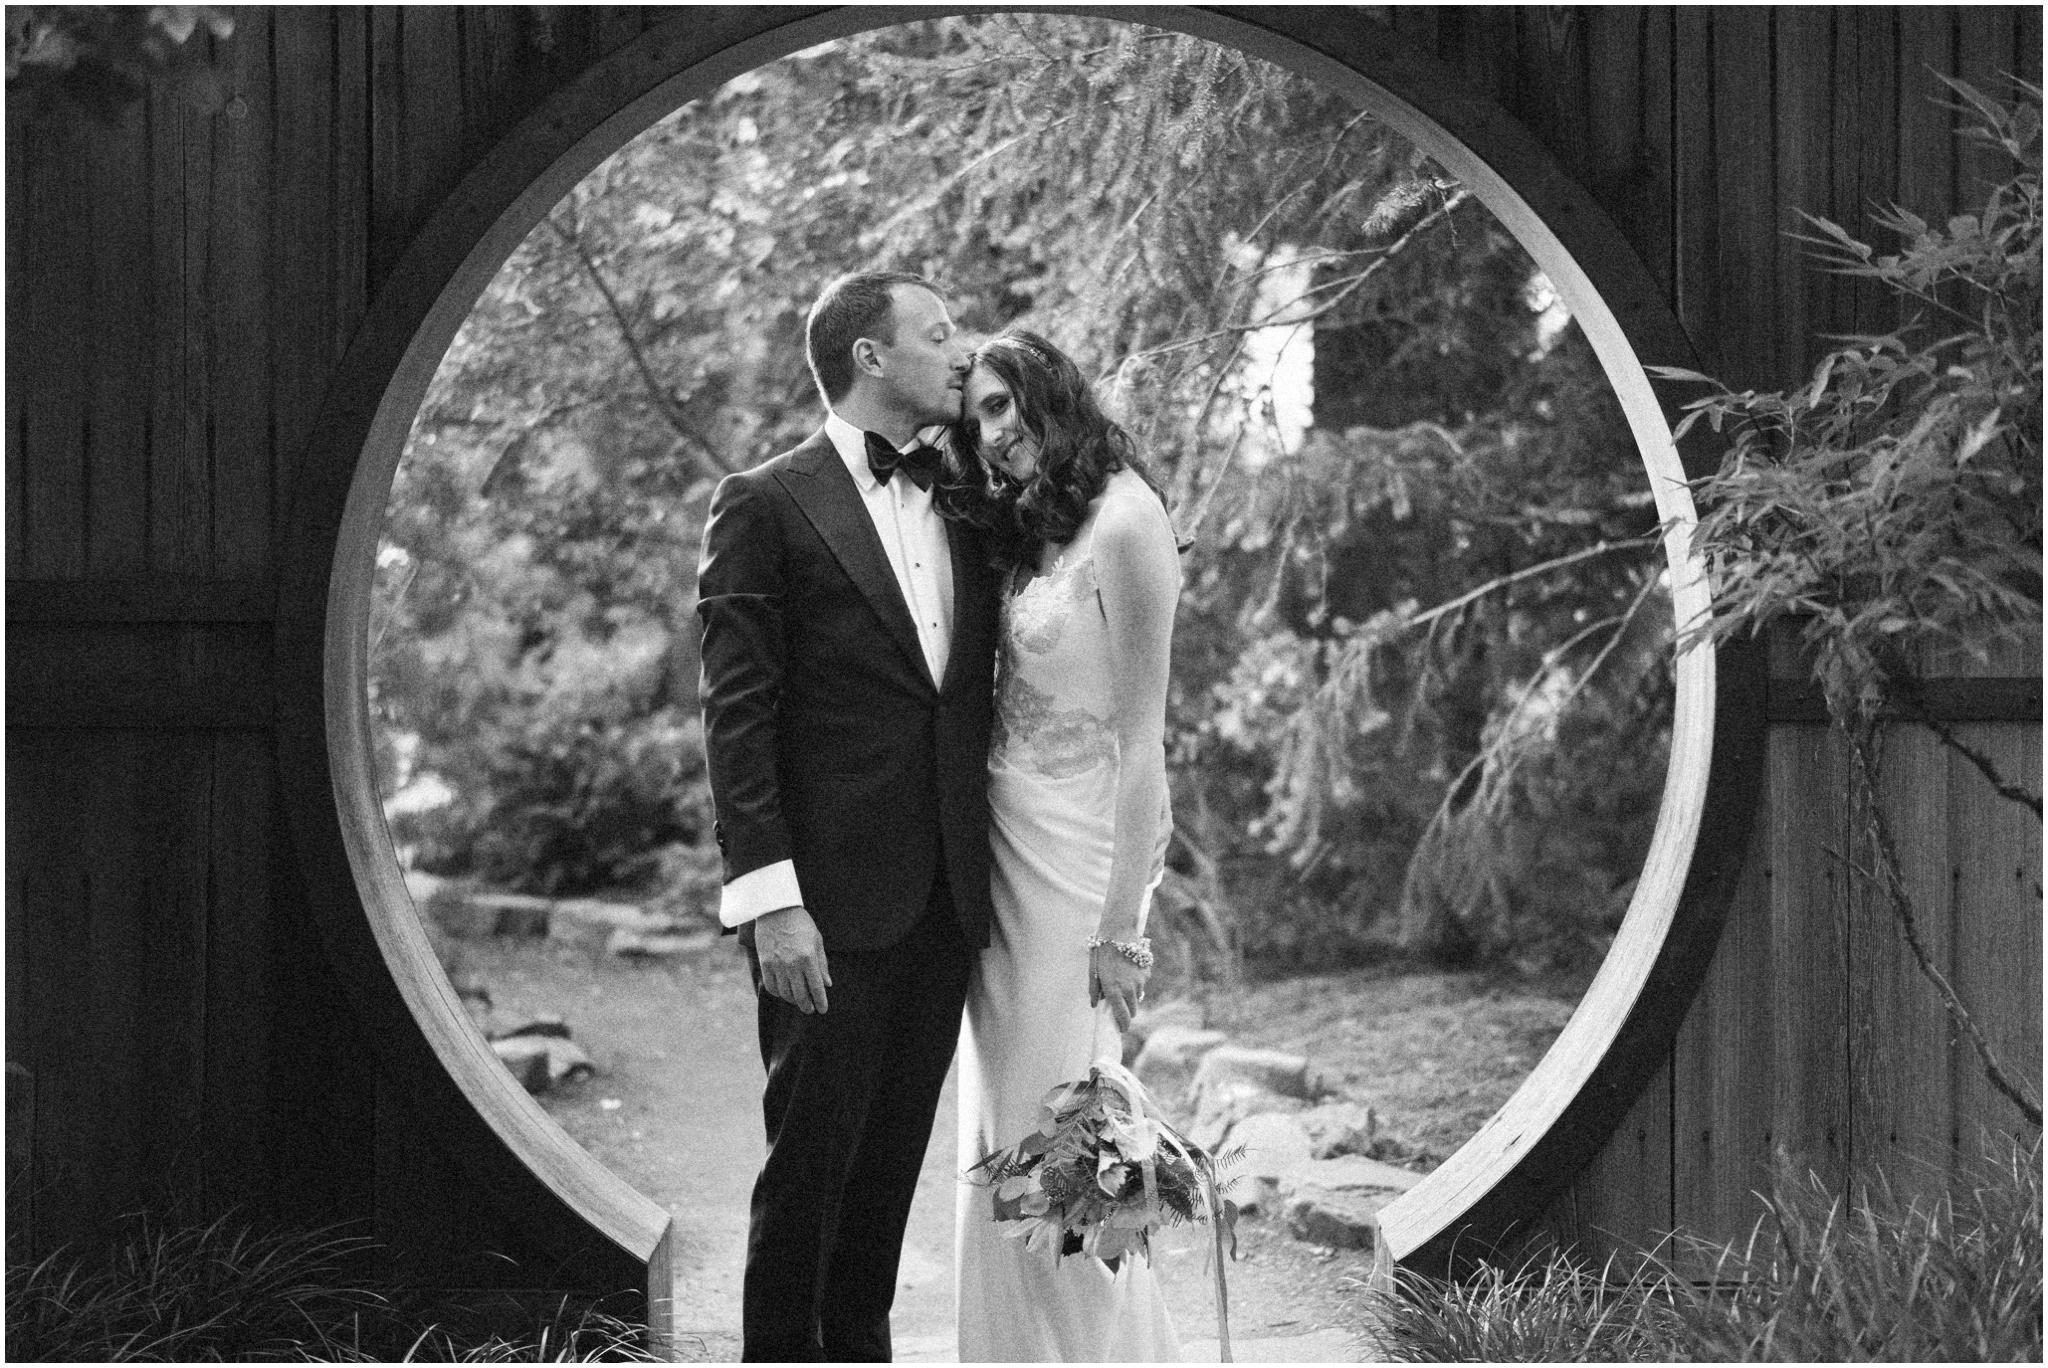 TJ-Romero-Photographer_Handcrafted-nostalgic-romantic-17.jpg